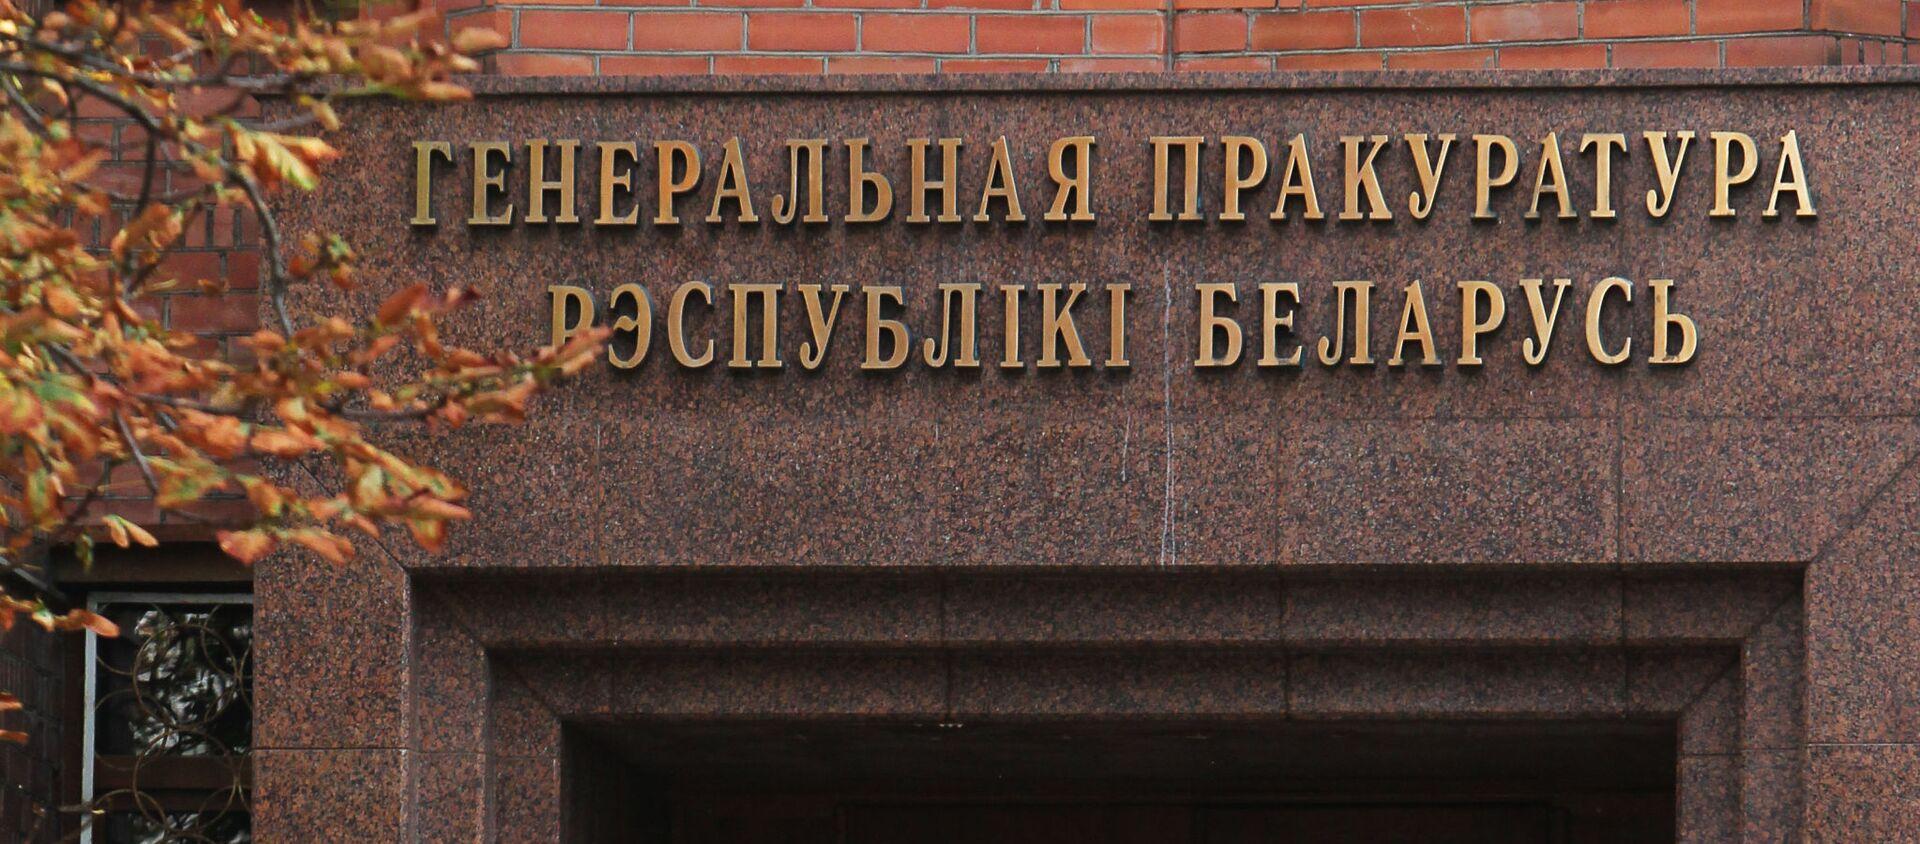 Prokuratura Generalna Białorusi - Sputnik Polska, 1920, 30.04.2021